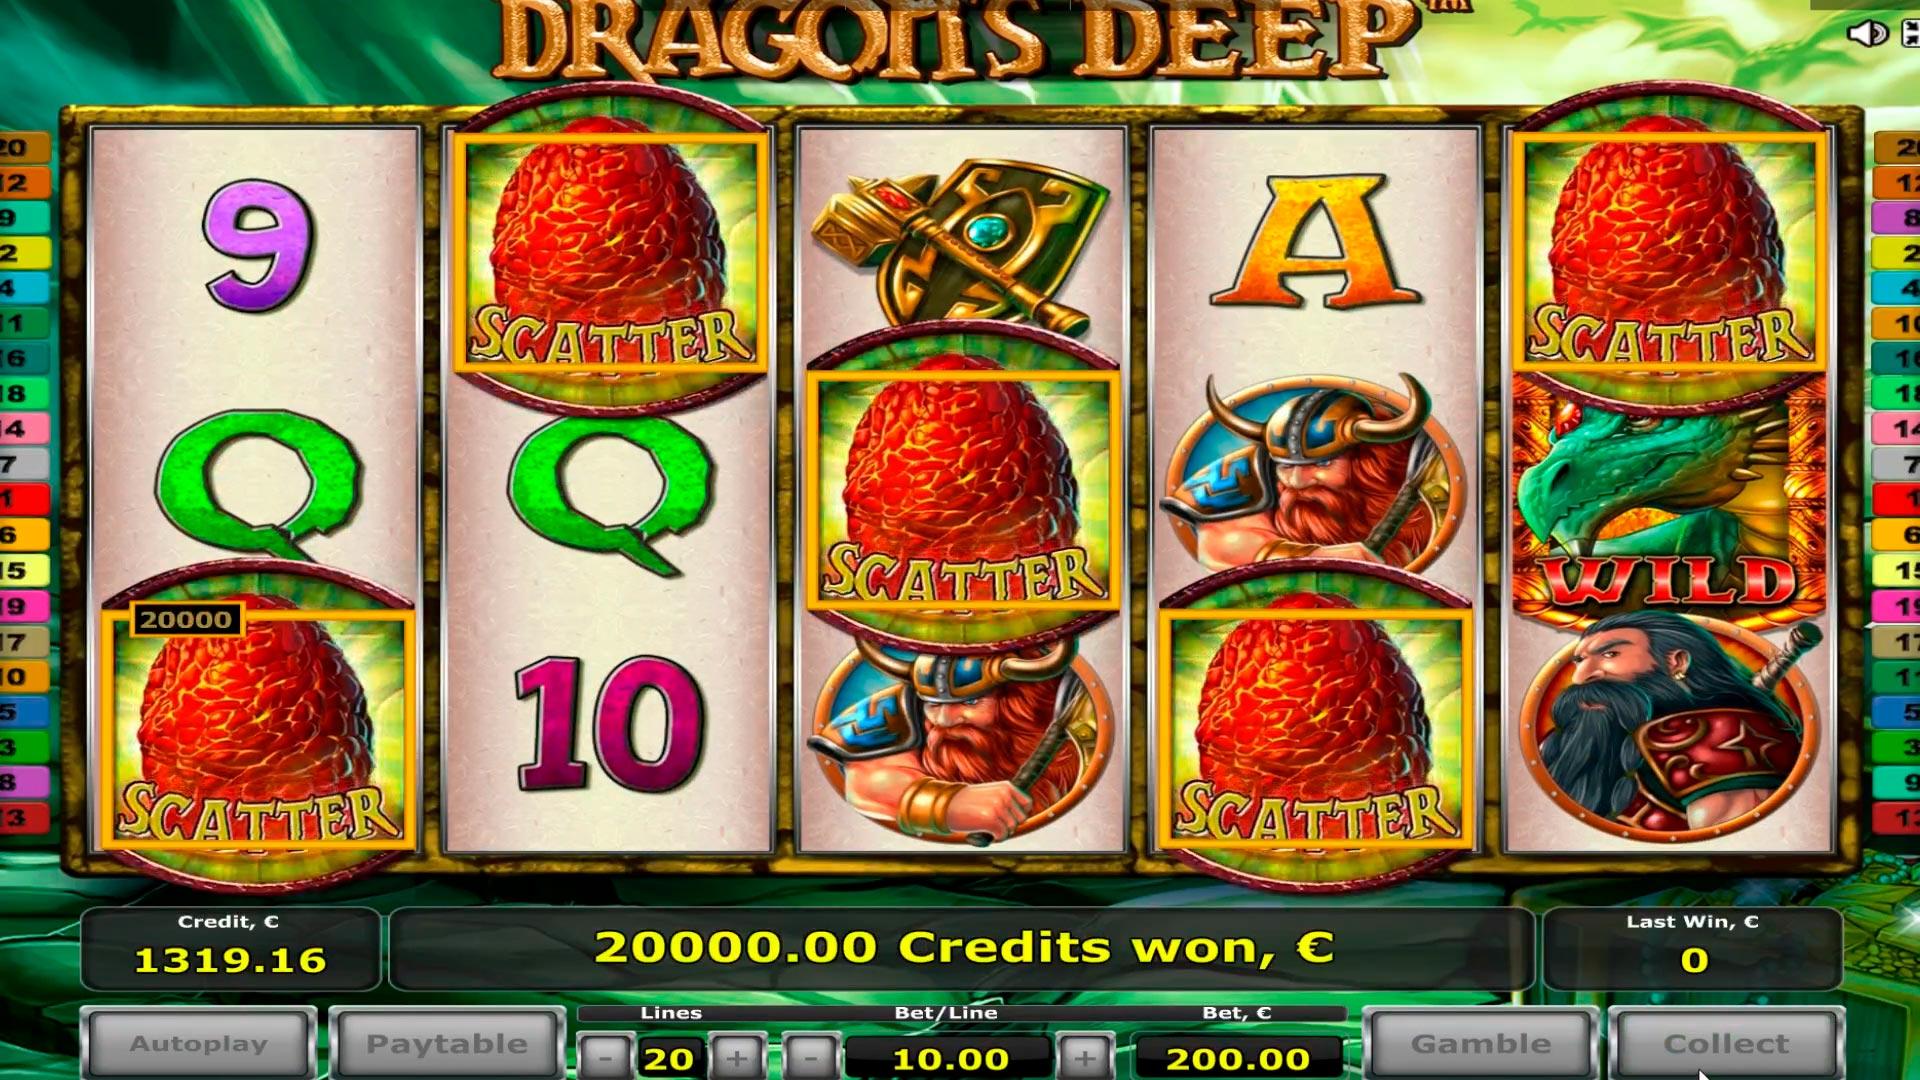 Grande vittoria del casinò con draghi giganti !!! 5 disperde !!! Vinci € 40.000!